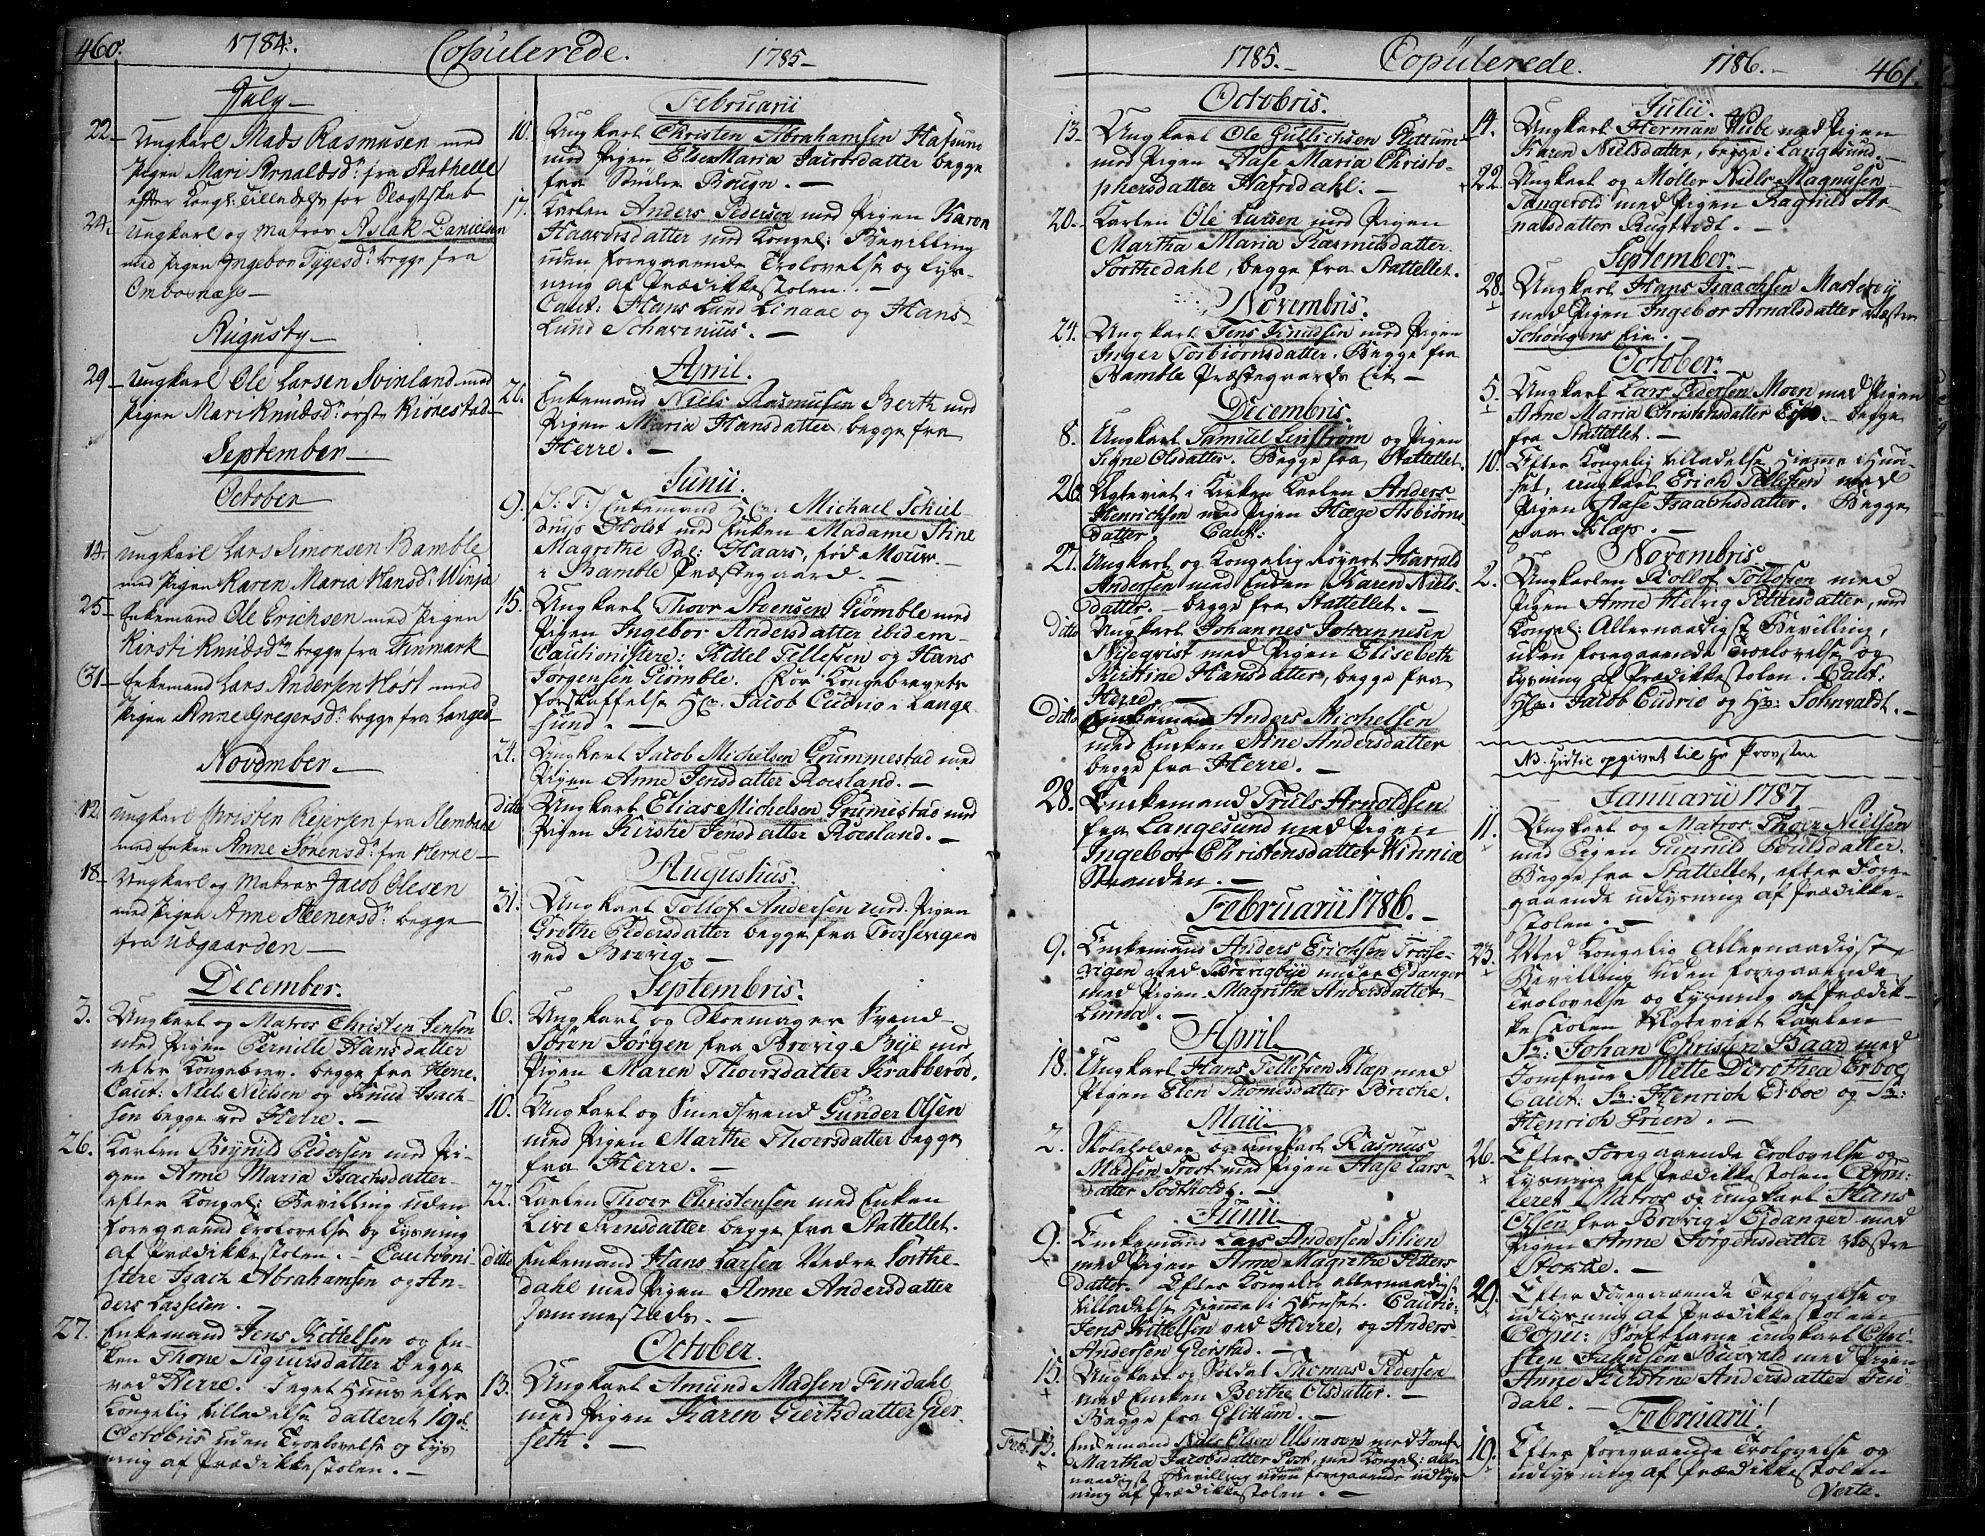 SAKO, Bamble kirkebøker, F/Fa/L0002: Ministerialbok nr. I 2, 1775-1814, s. 460-461